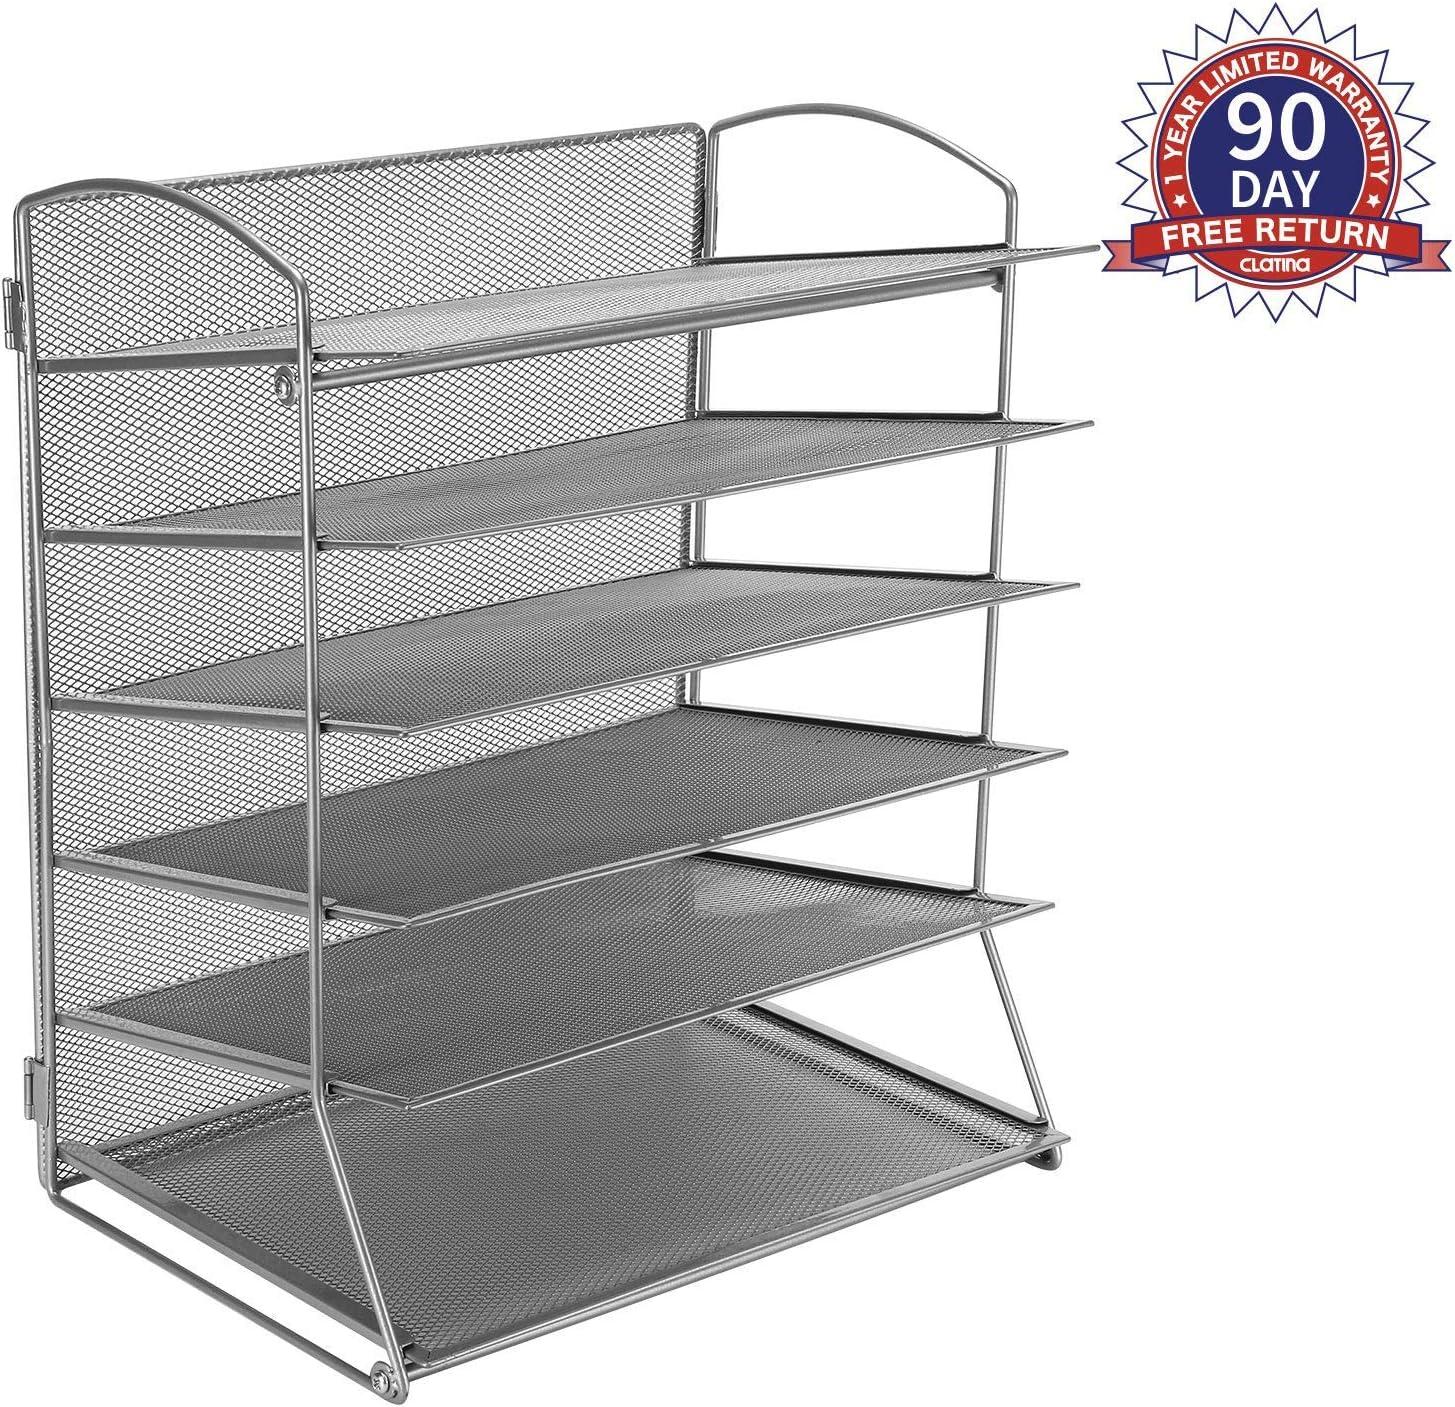 6 Metal Mesh Desktop File Organizer Desk Letter Tray for Office or Home, Grey